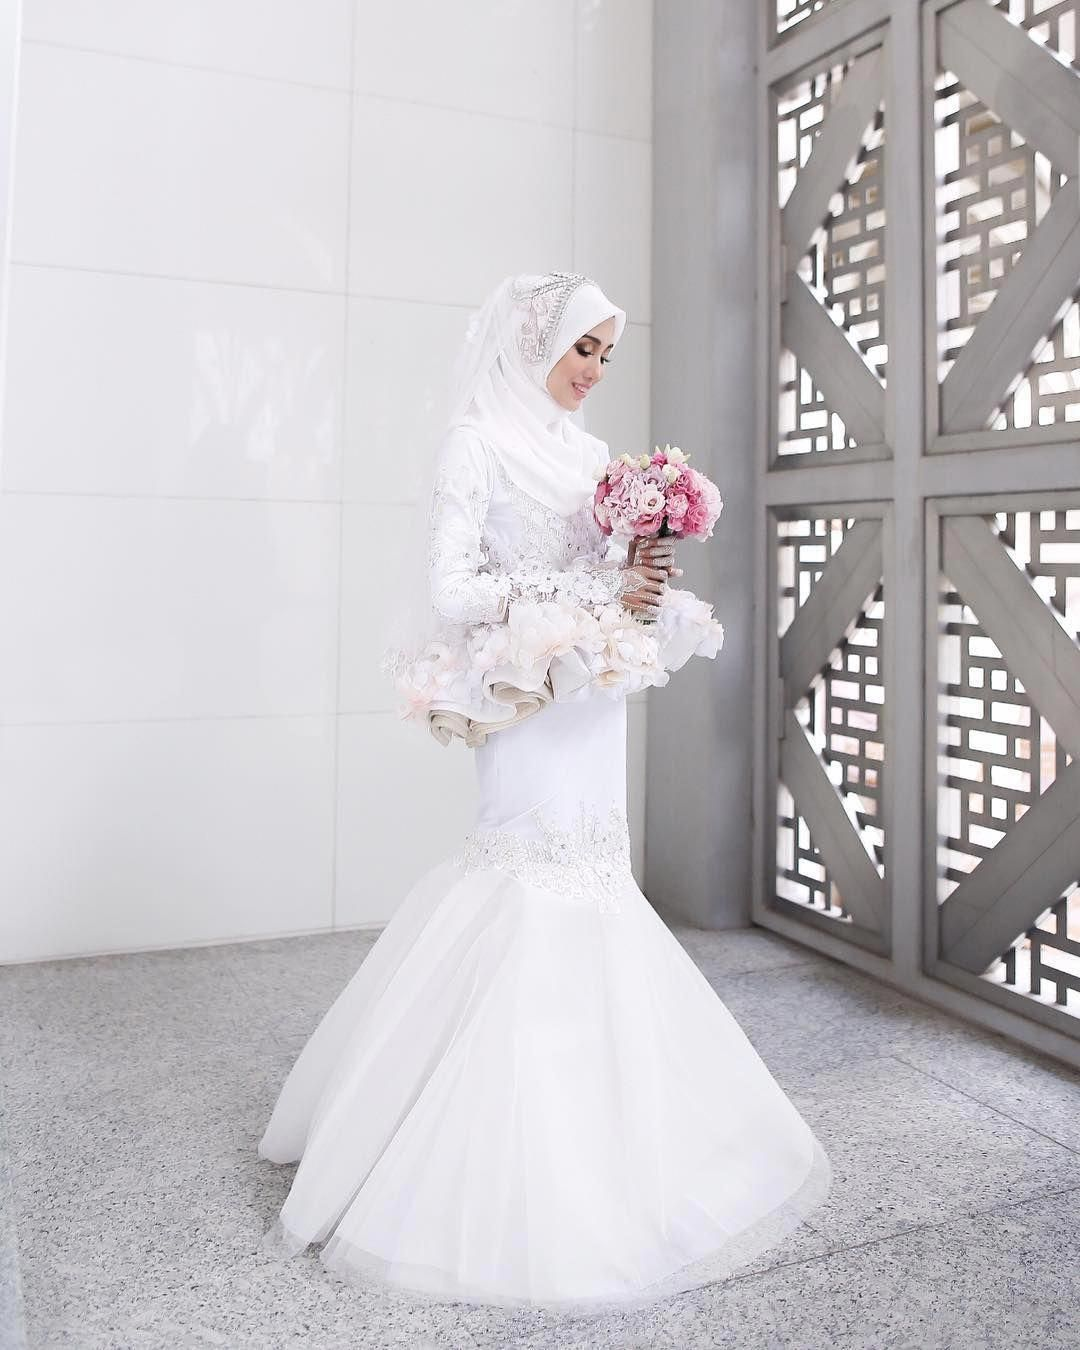 Alia bastamam wedding dress  My dream wedding dress do come true Thank you minaz